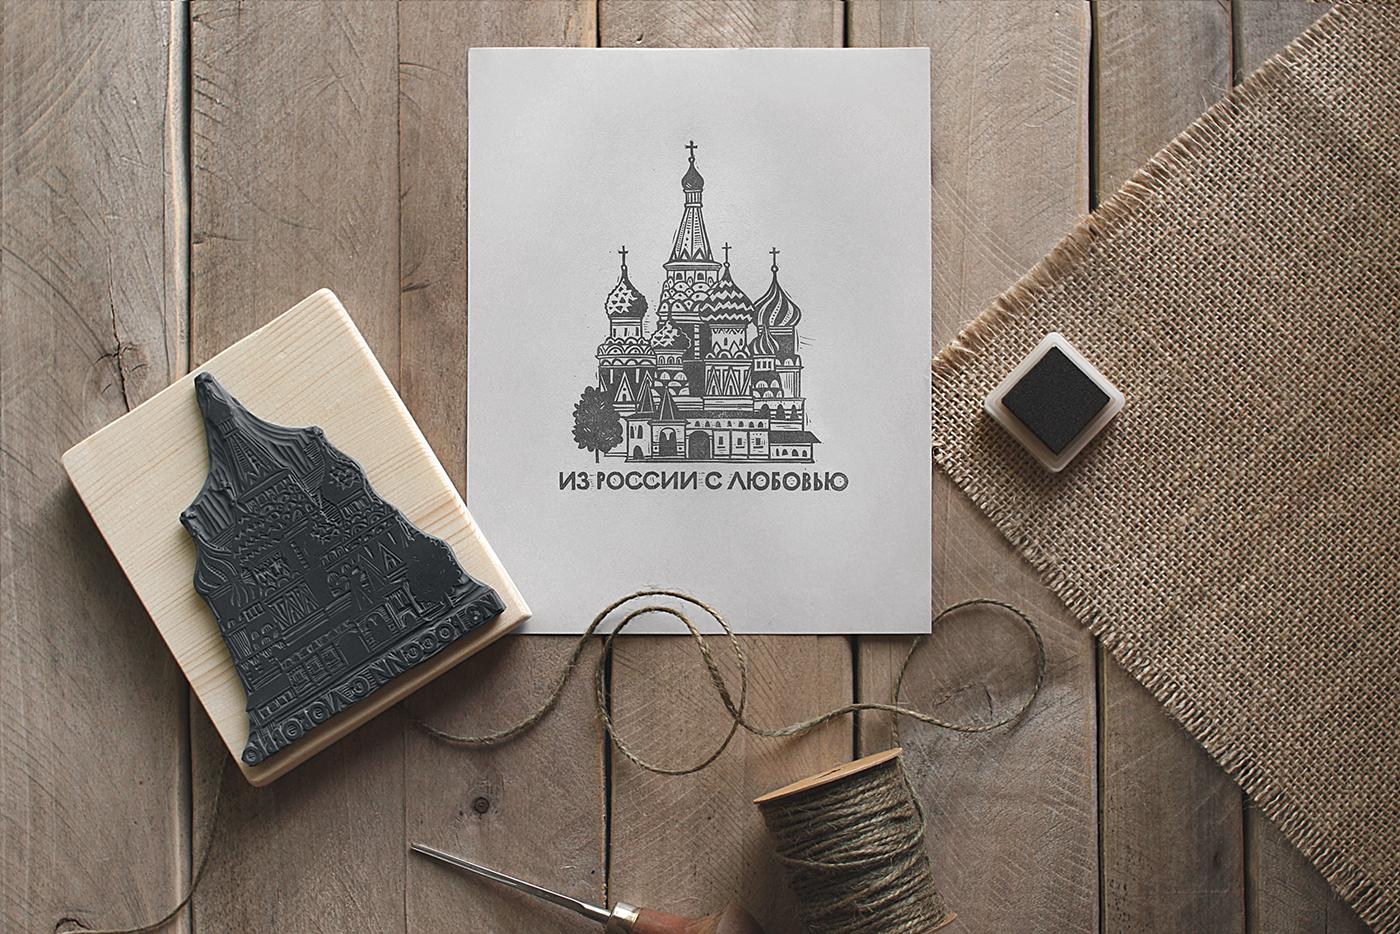 A Set of Linocut Stamps for a Cafe by Alesya Nesolenova